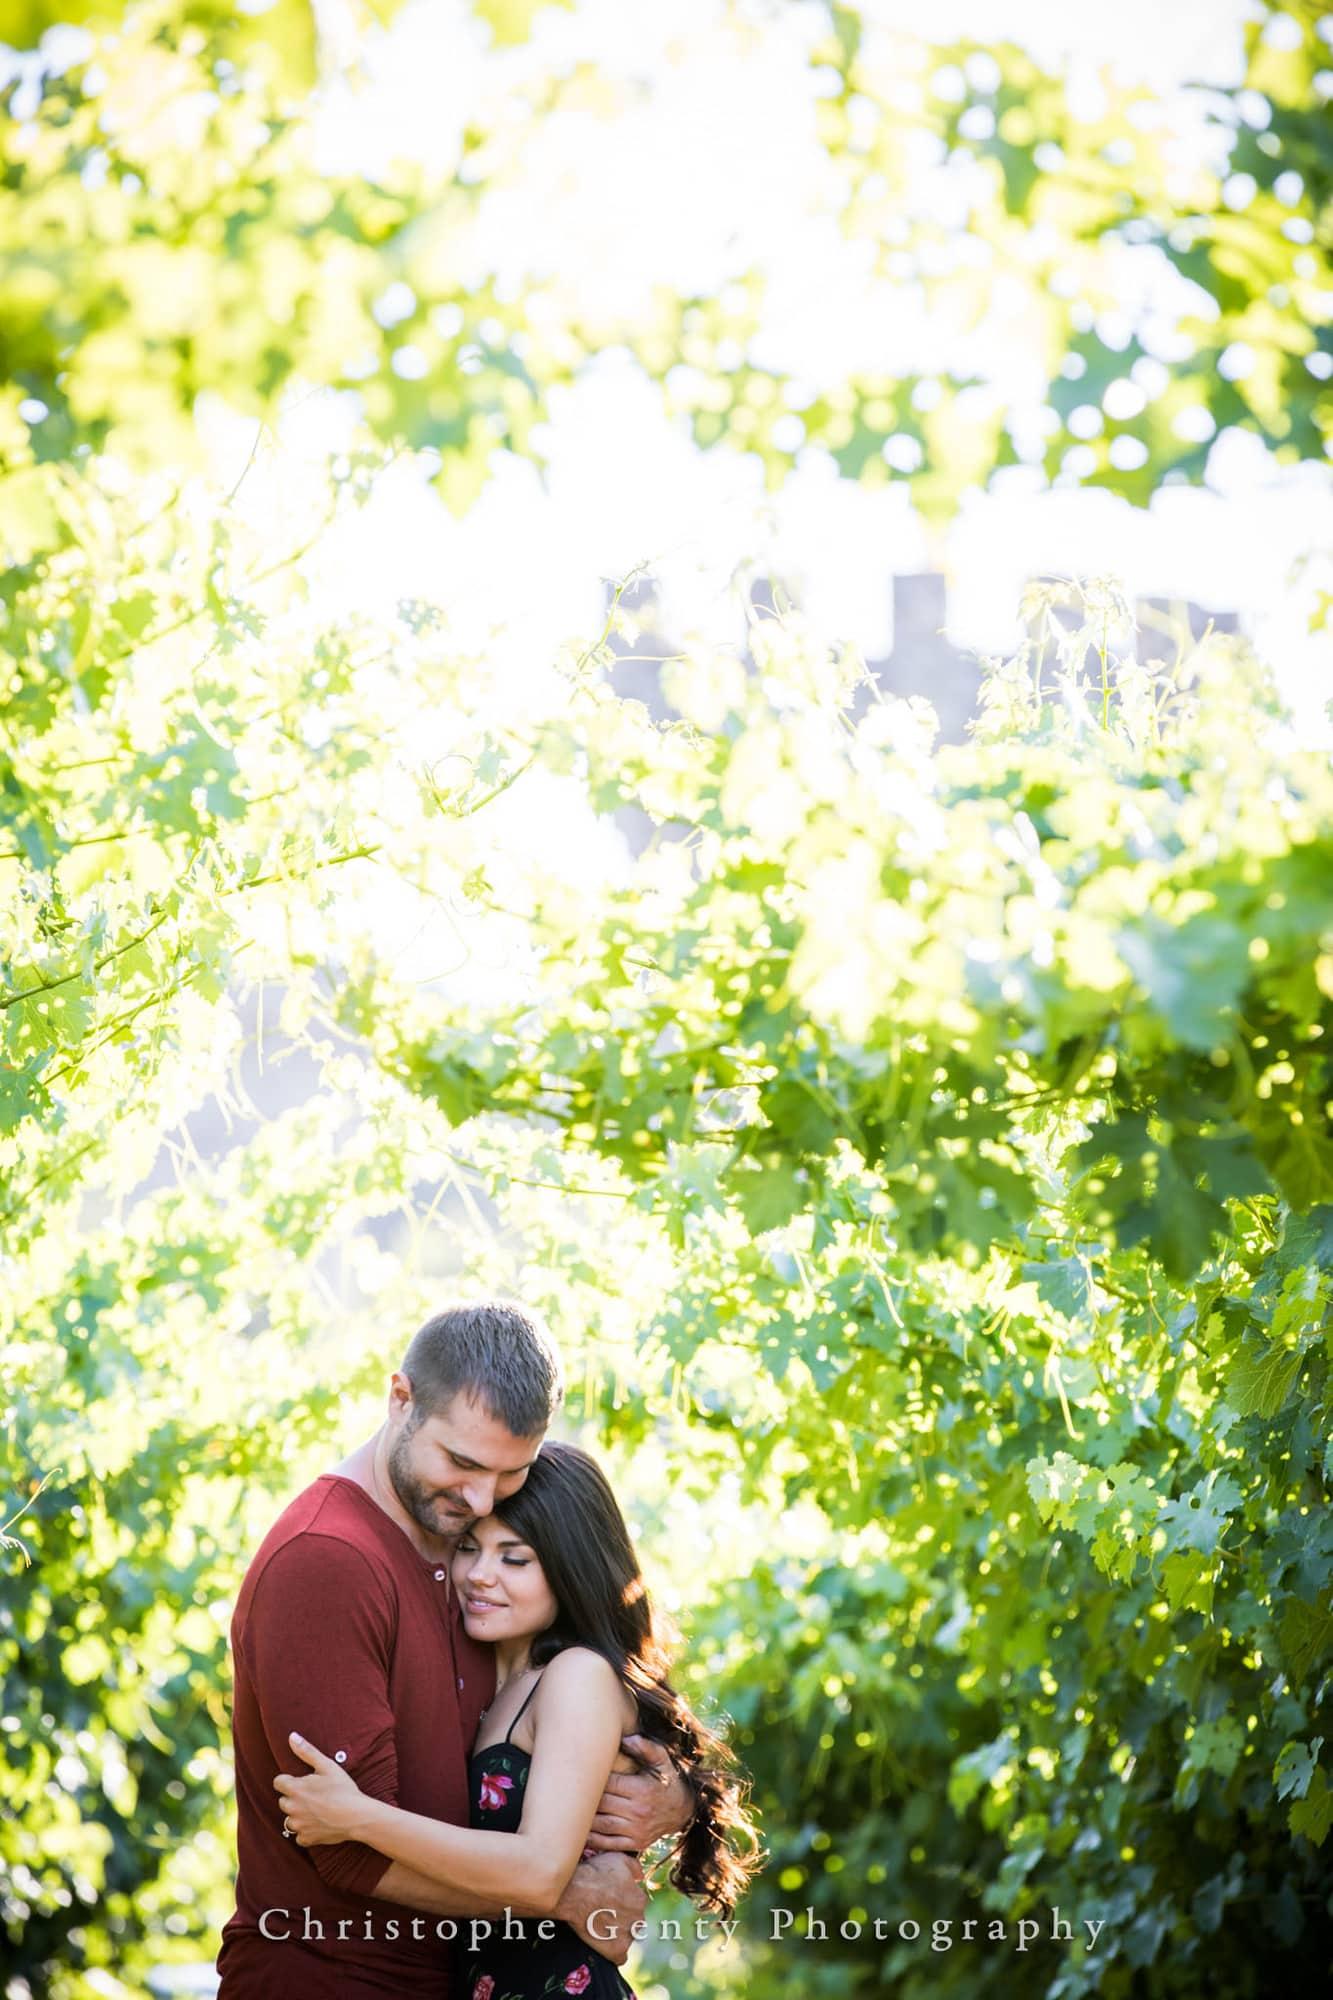 Castello di Amorosa Marriage Proposal Photography 360